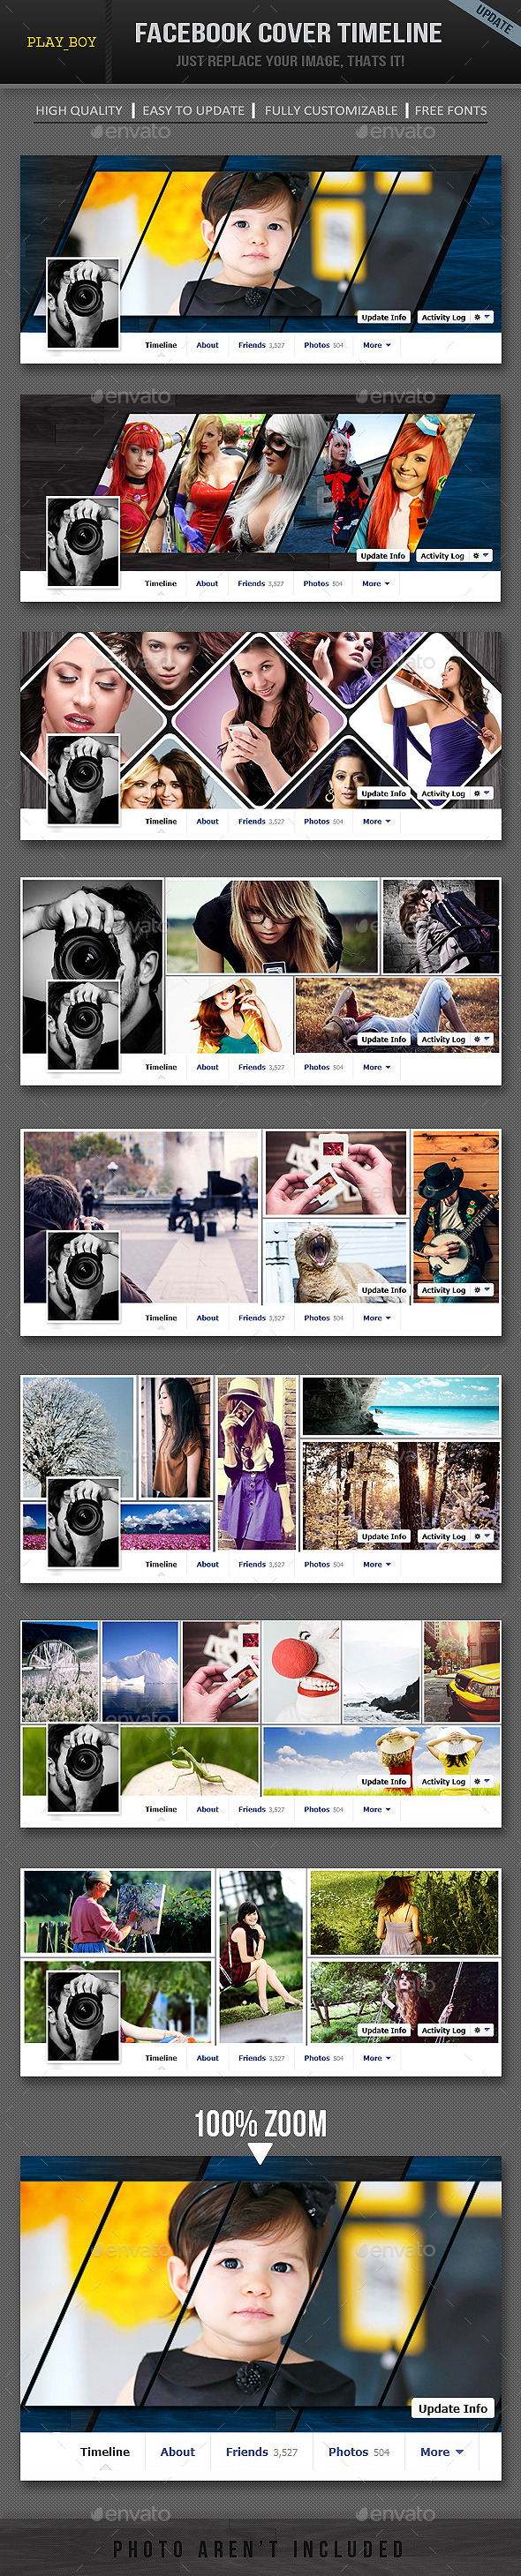 Facebook Timeline Cover Template - Facebook Timeline Covers Social Media